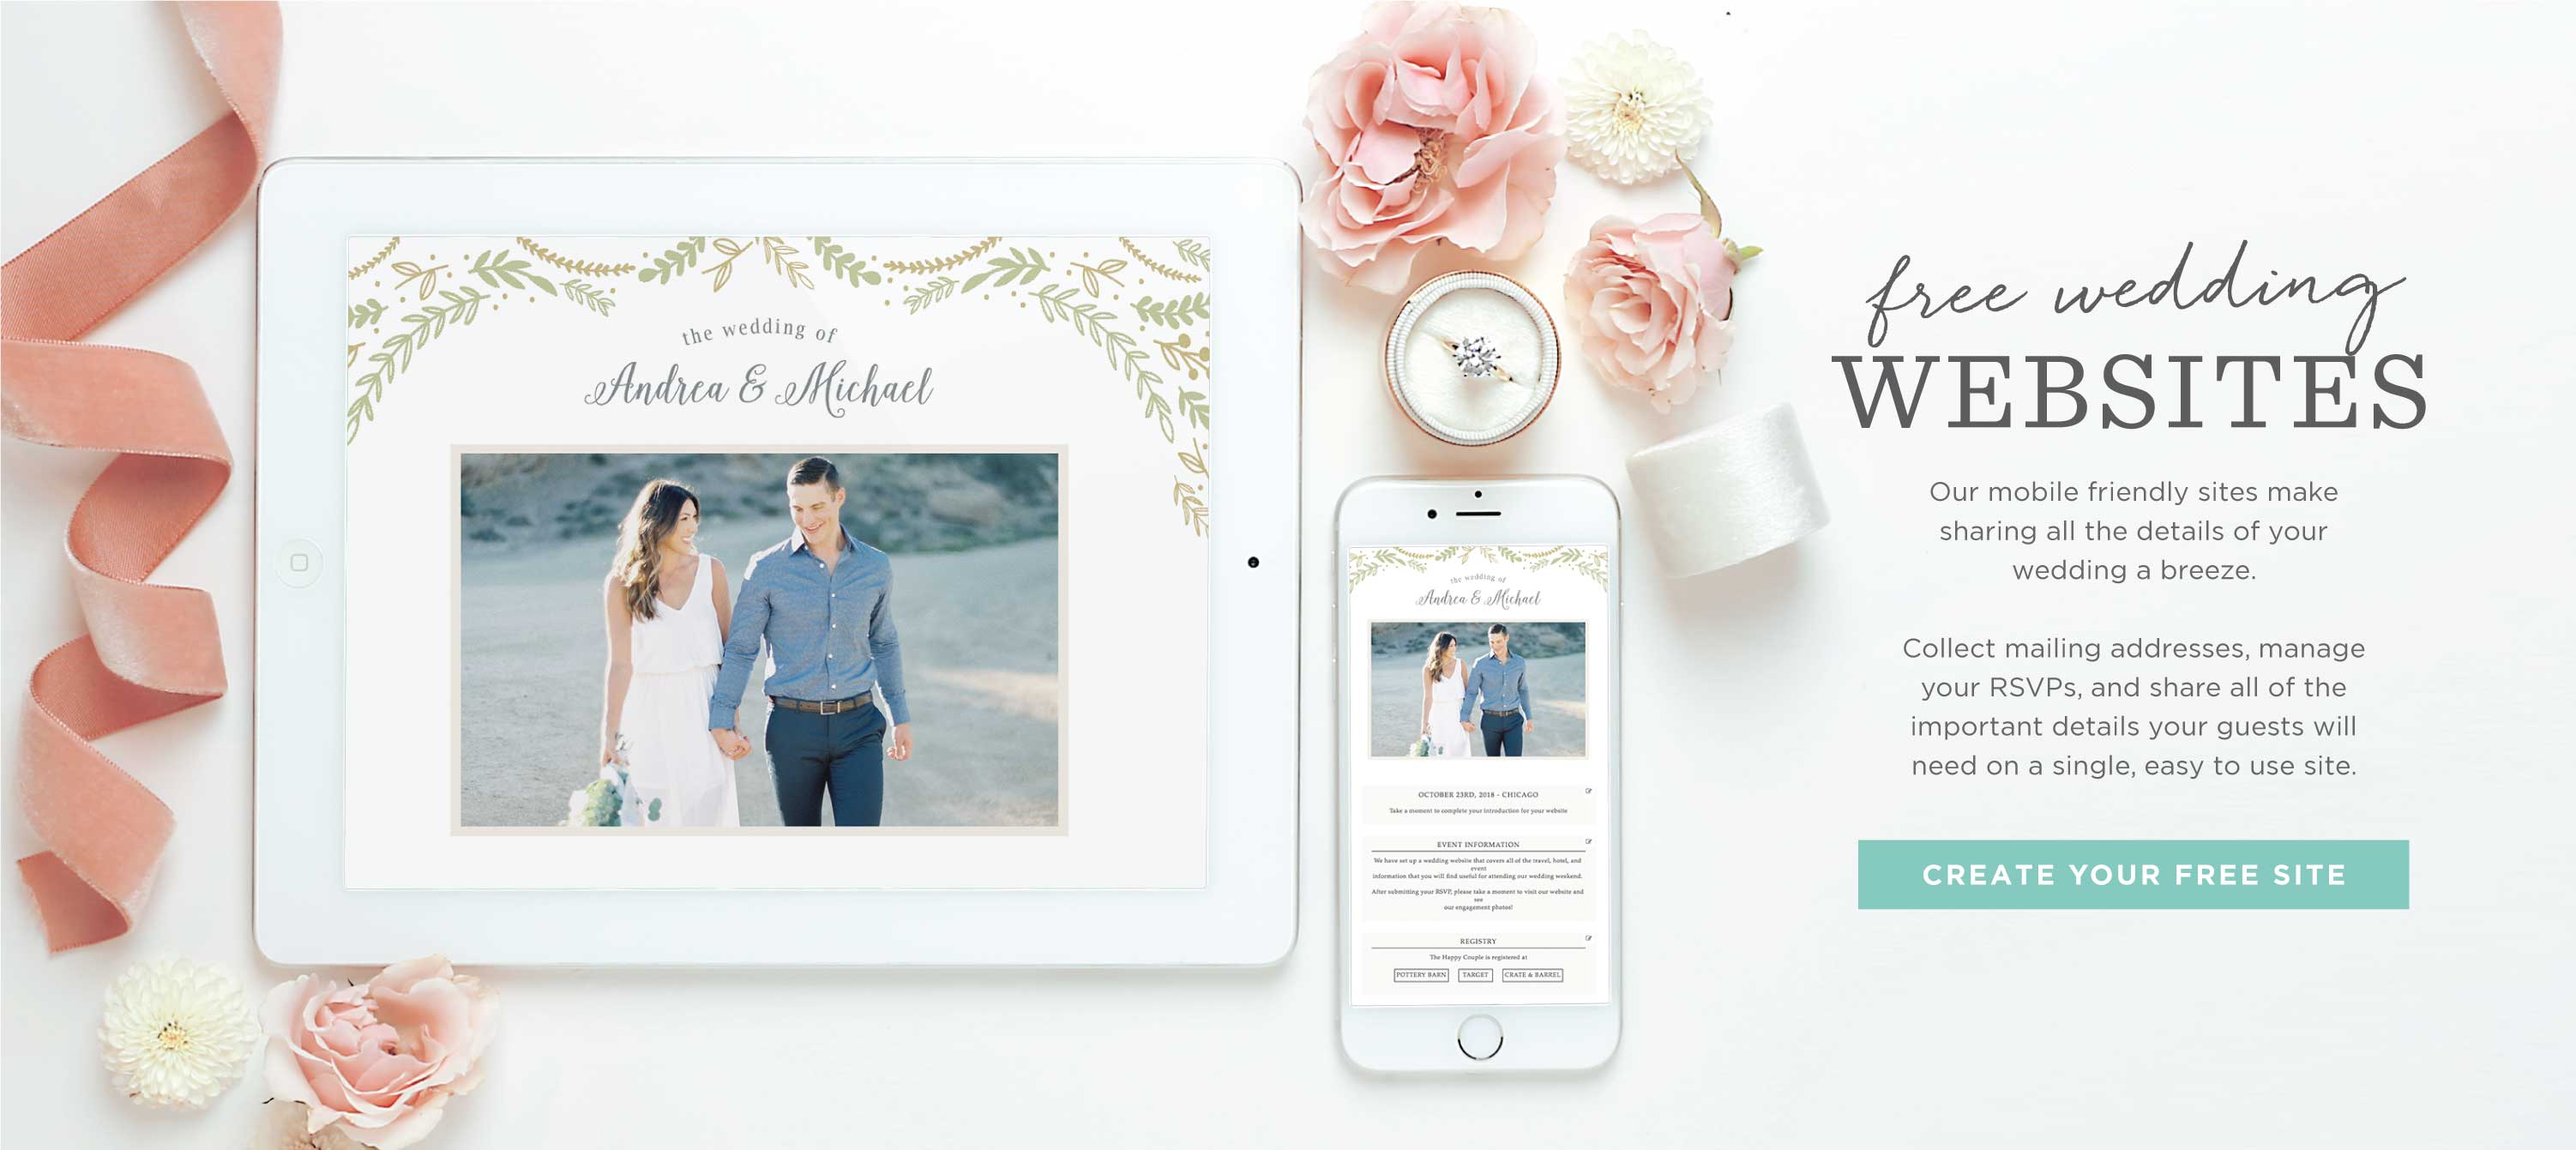 Free Wedding Websites by Basic Invite